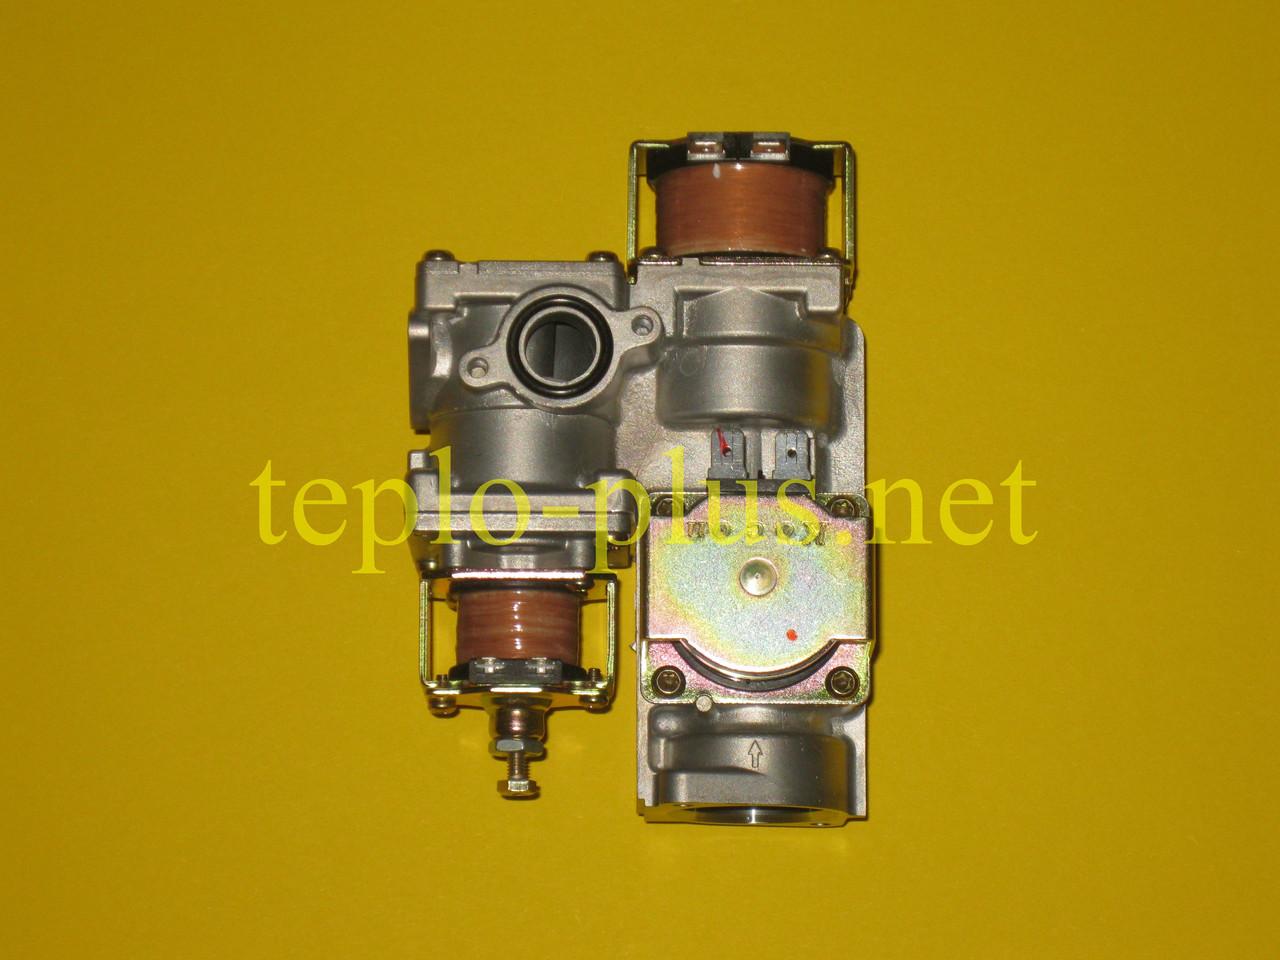 Газовый клапан GRV-301 (аналог UP-23-02) Daewoo Gasboiler DGB-100, 130, 160, 200, 250, 300 ICH/KFC/MSC/MES